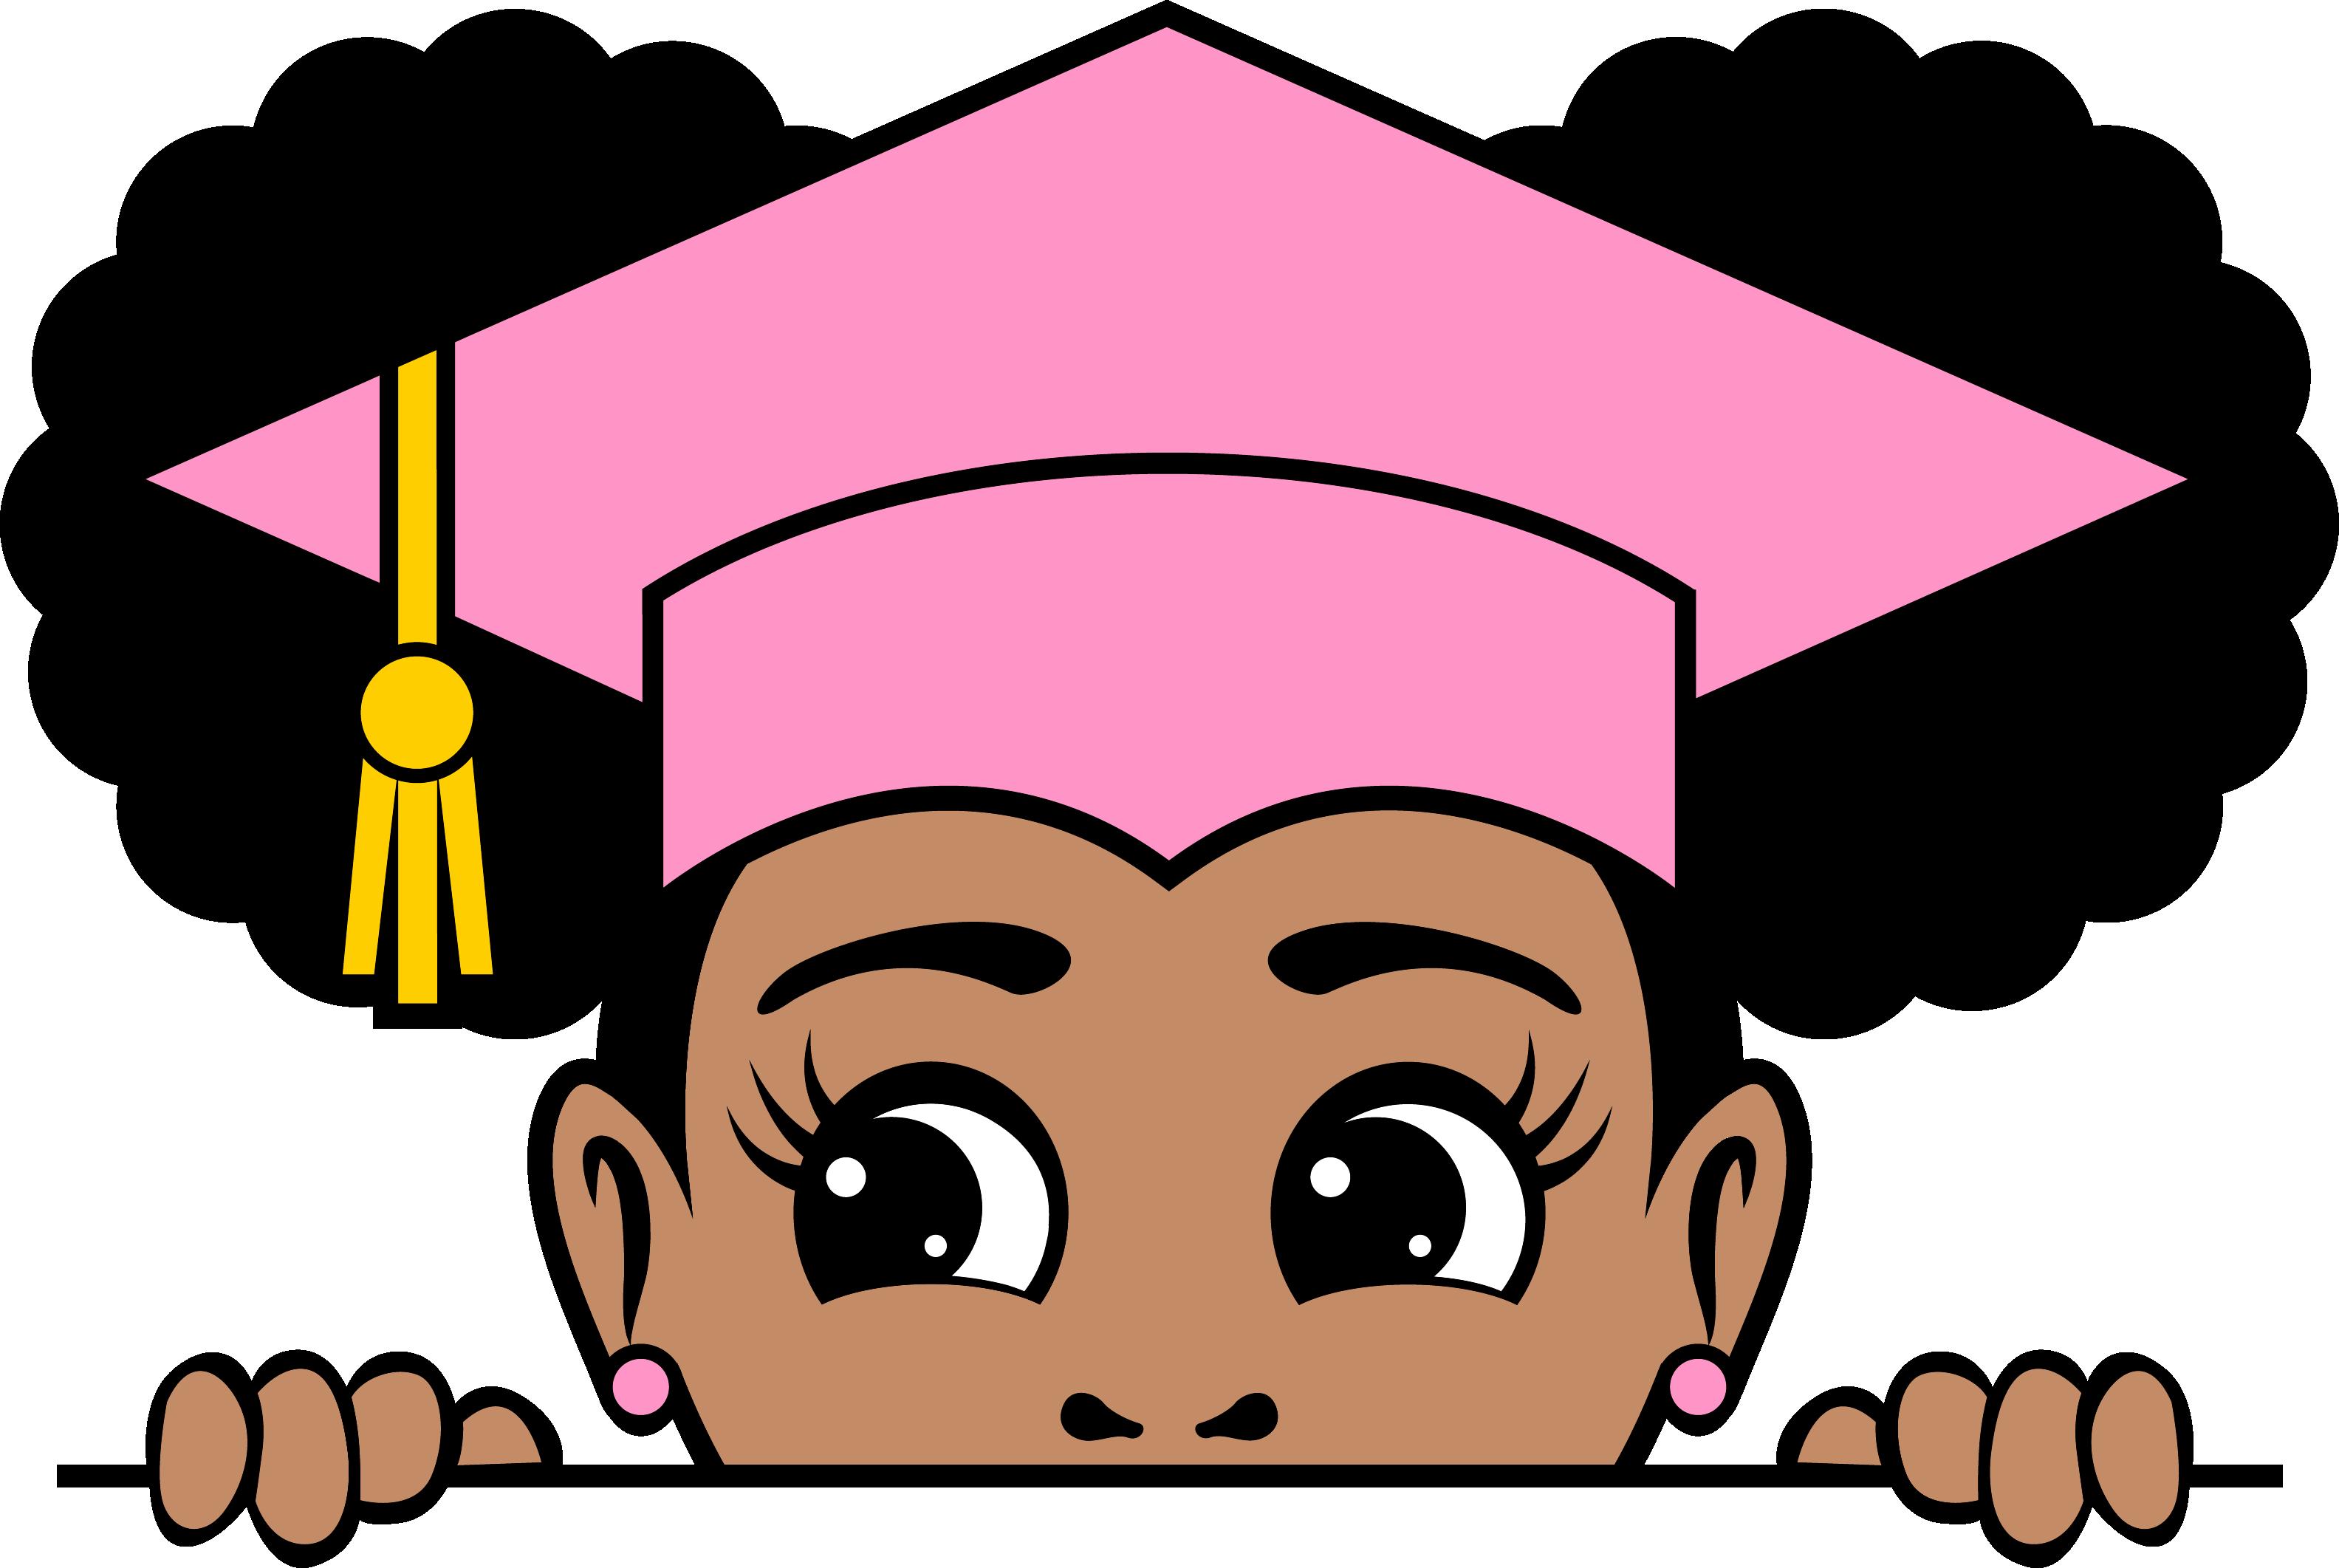 Peekaboo afro puffs grad girl 11